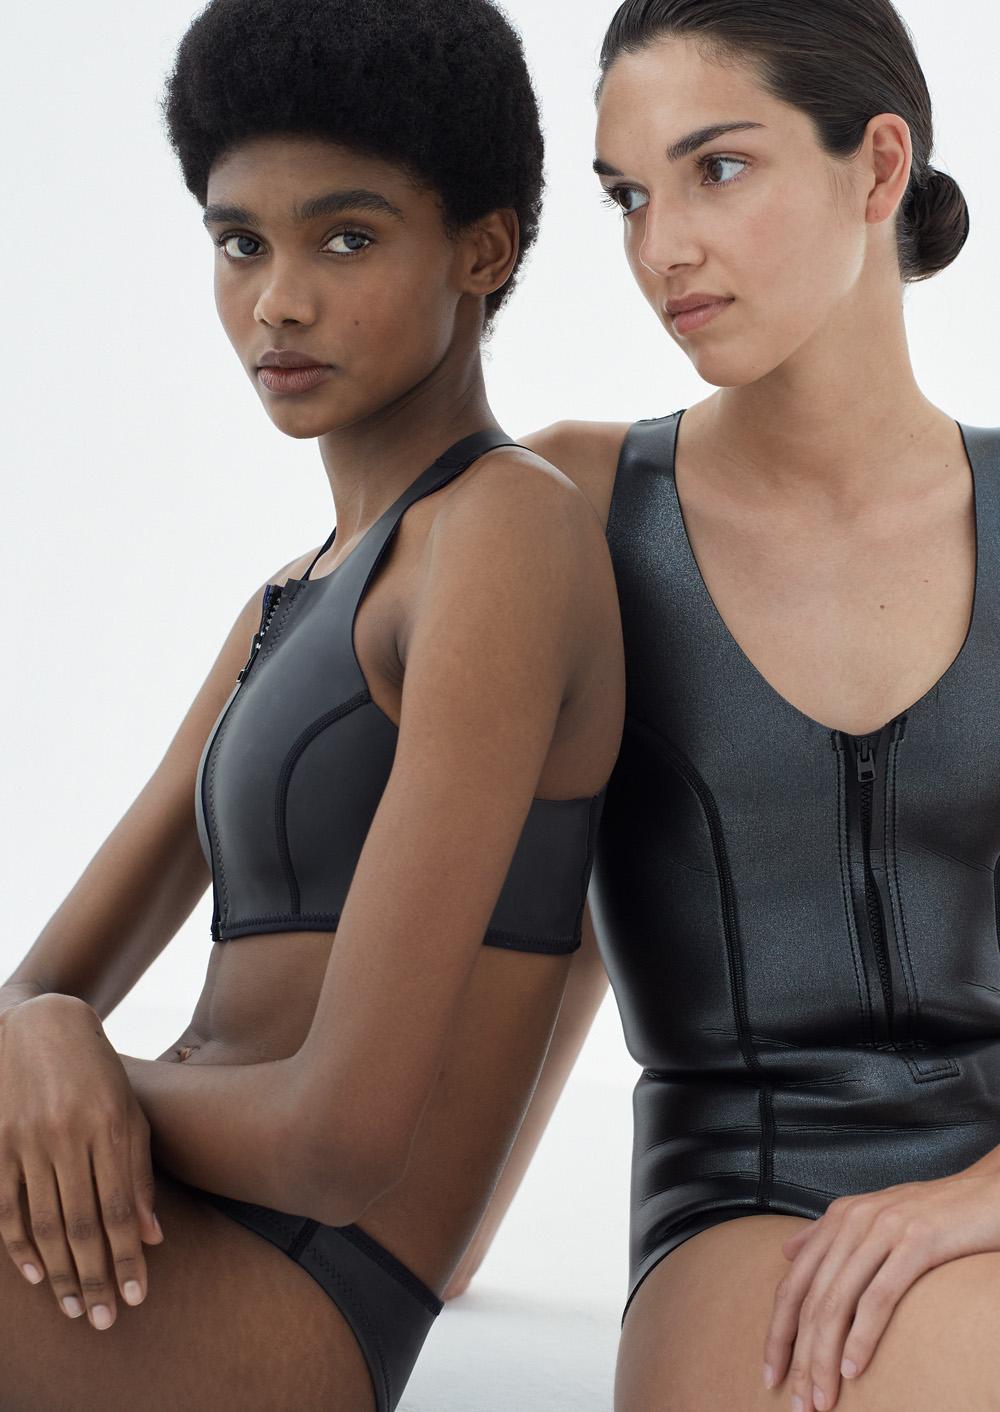 Neoprene bikini, petroleum free surf ecoprene, Sustainable Swimwear. Margo in black by NOW_THEN